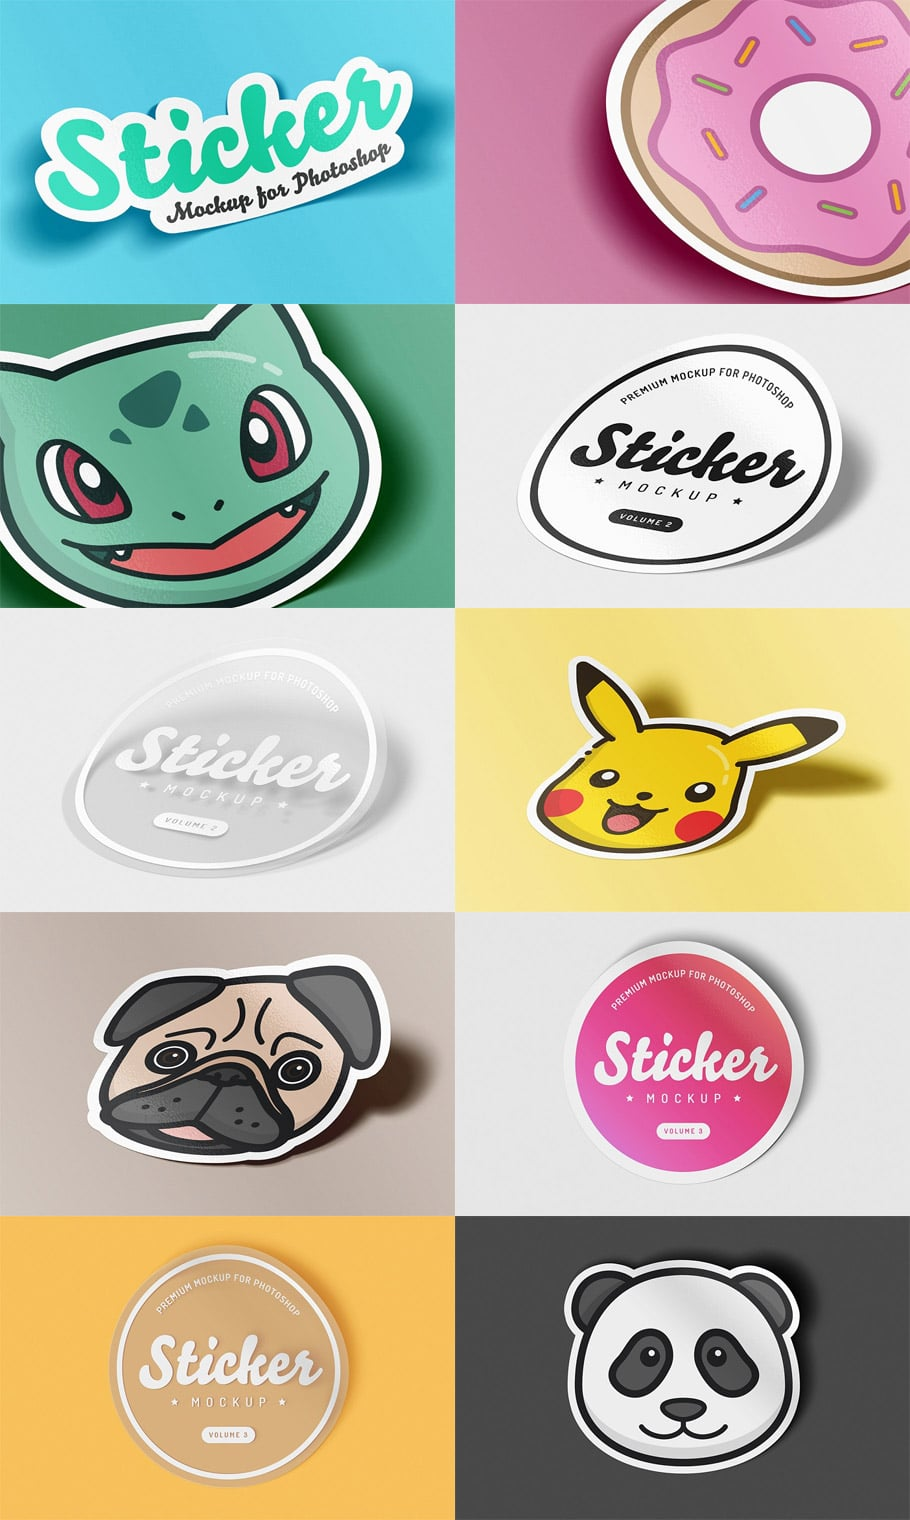 Sticker Mockup PSD Bundle